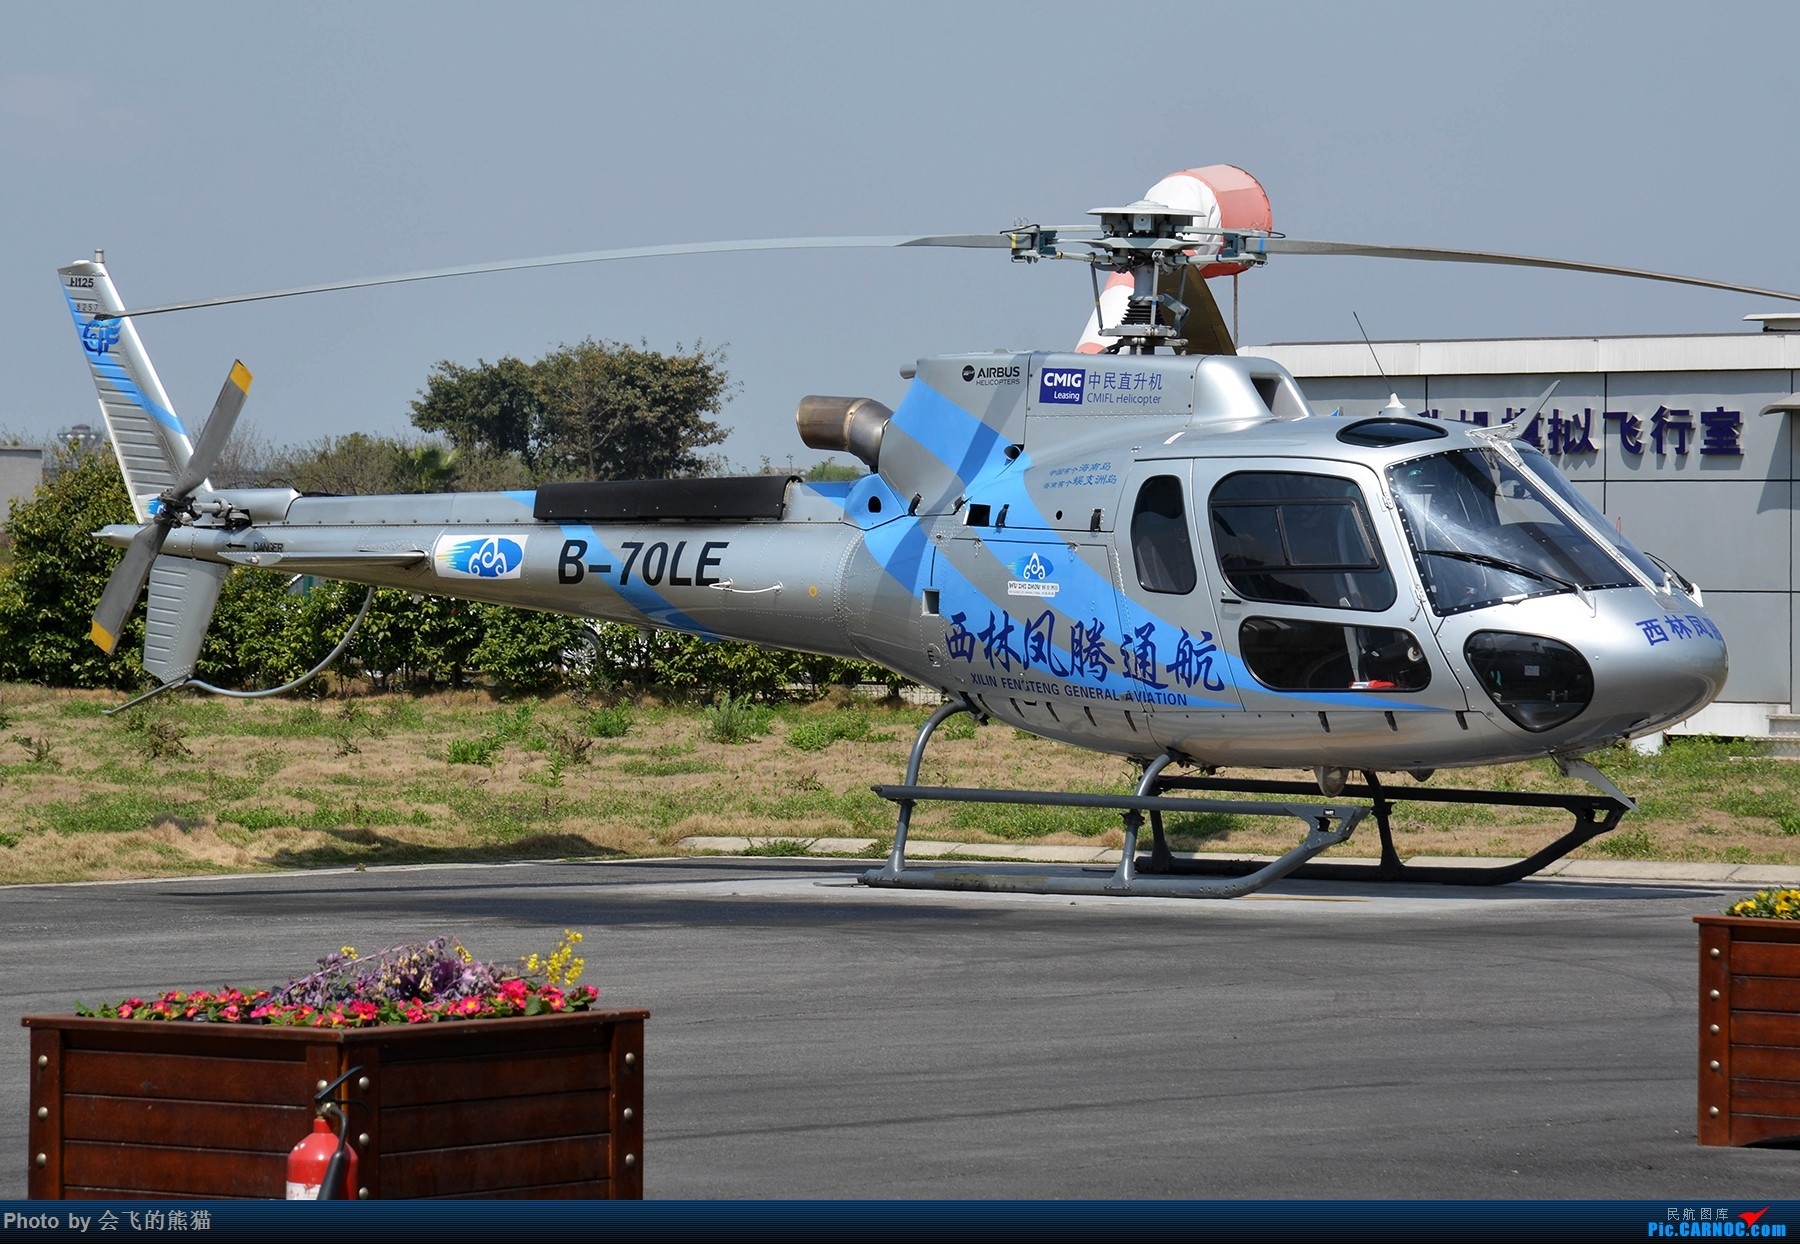 Re:[原创]偶遇 EUROCOPTER AS350B3 B-70LE 西林凤腾广汉基地